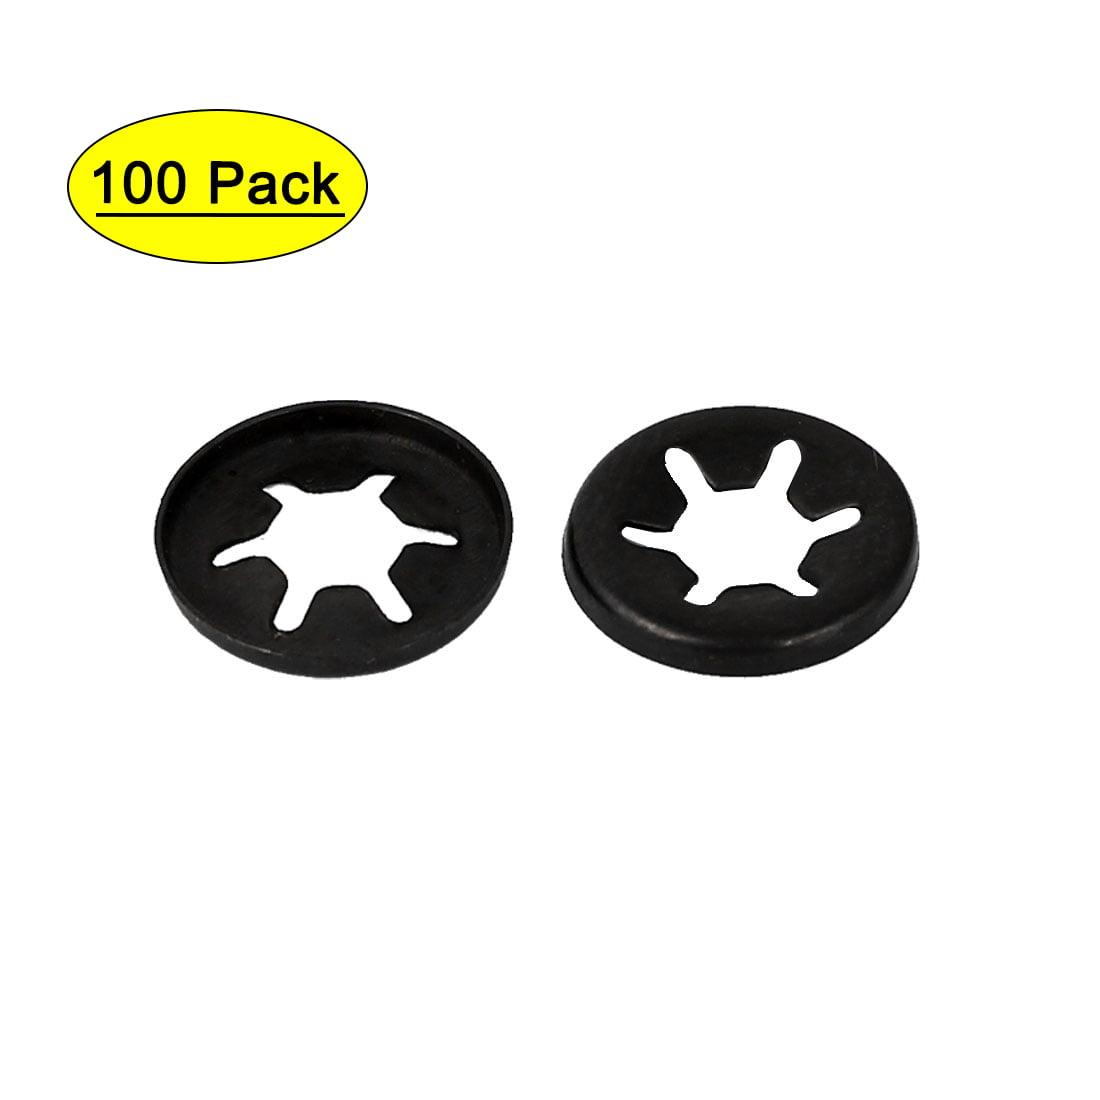 Star Nut Metal Push On Locking Washer Clips Fastener 20X2mm,3mm,4mm,5mm80PCE